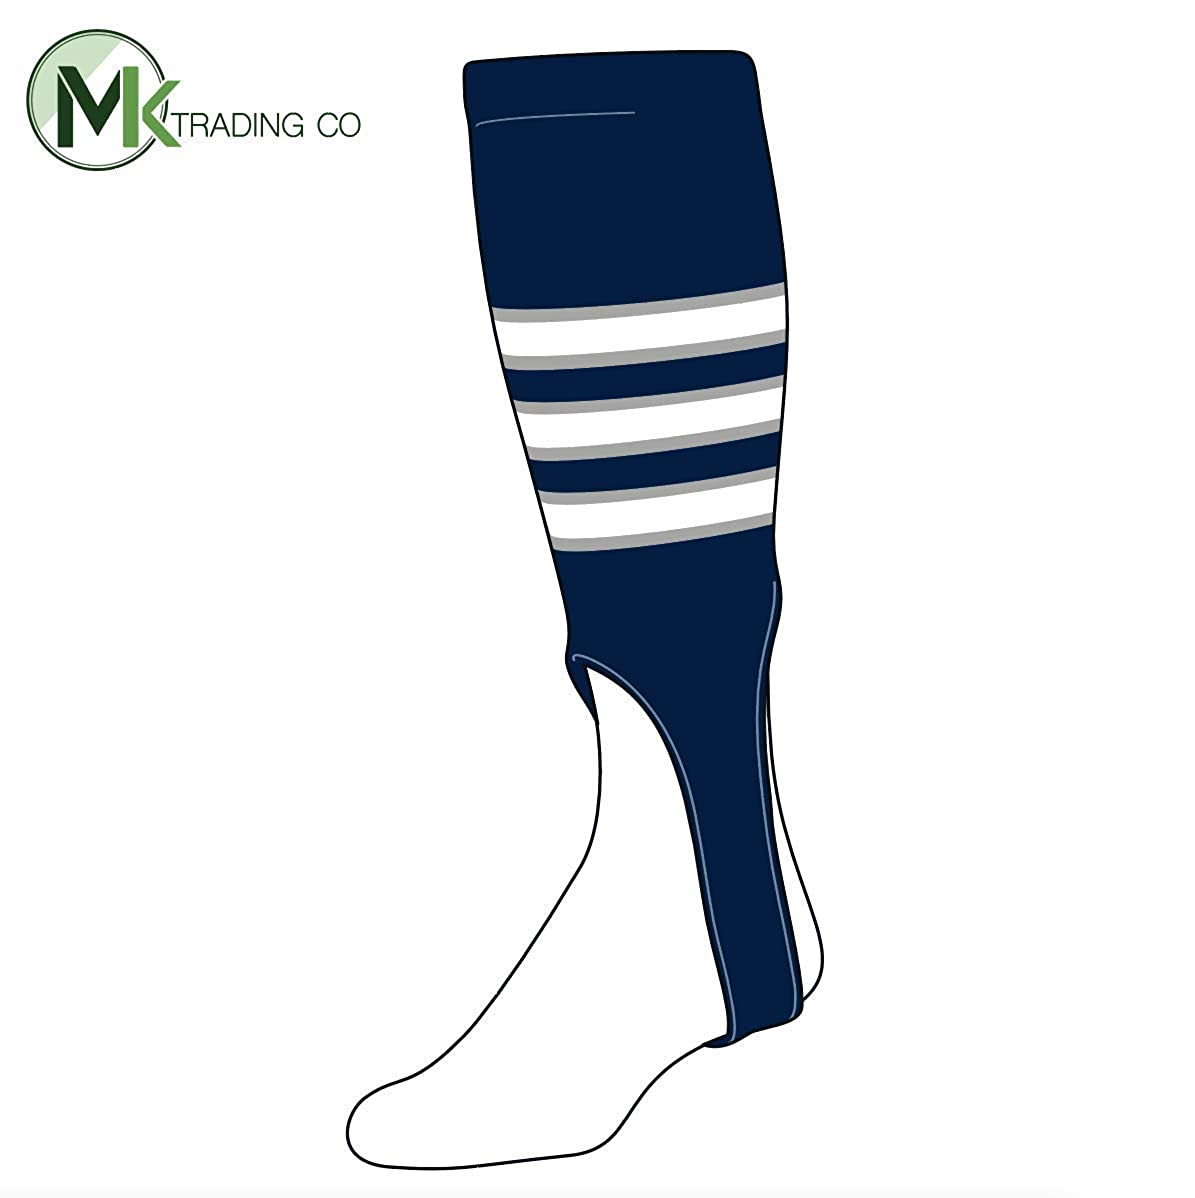 TCK Socks Socks SOCKSHOSIERY 19 メンズ US サイズ: Large 19 inch years) (16+ years) B07MWCDCFQ, WSMウエットスーツマーケット:85e176ee --- cgt-tbc.fr